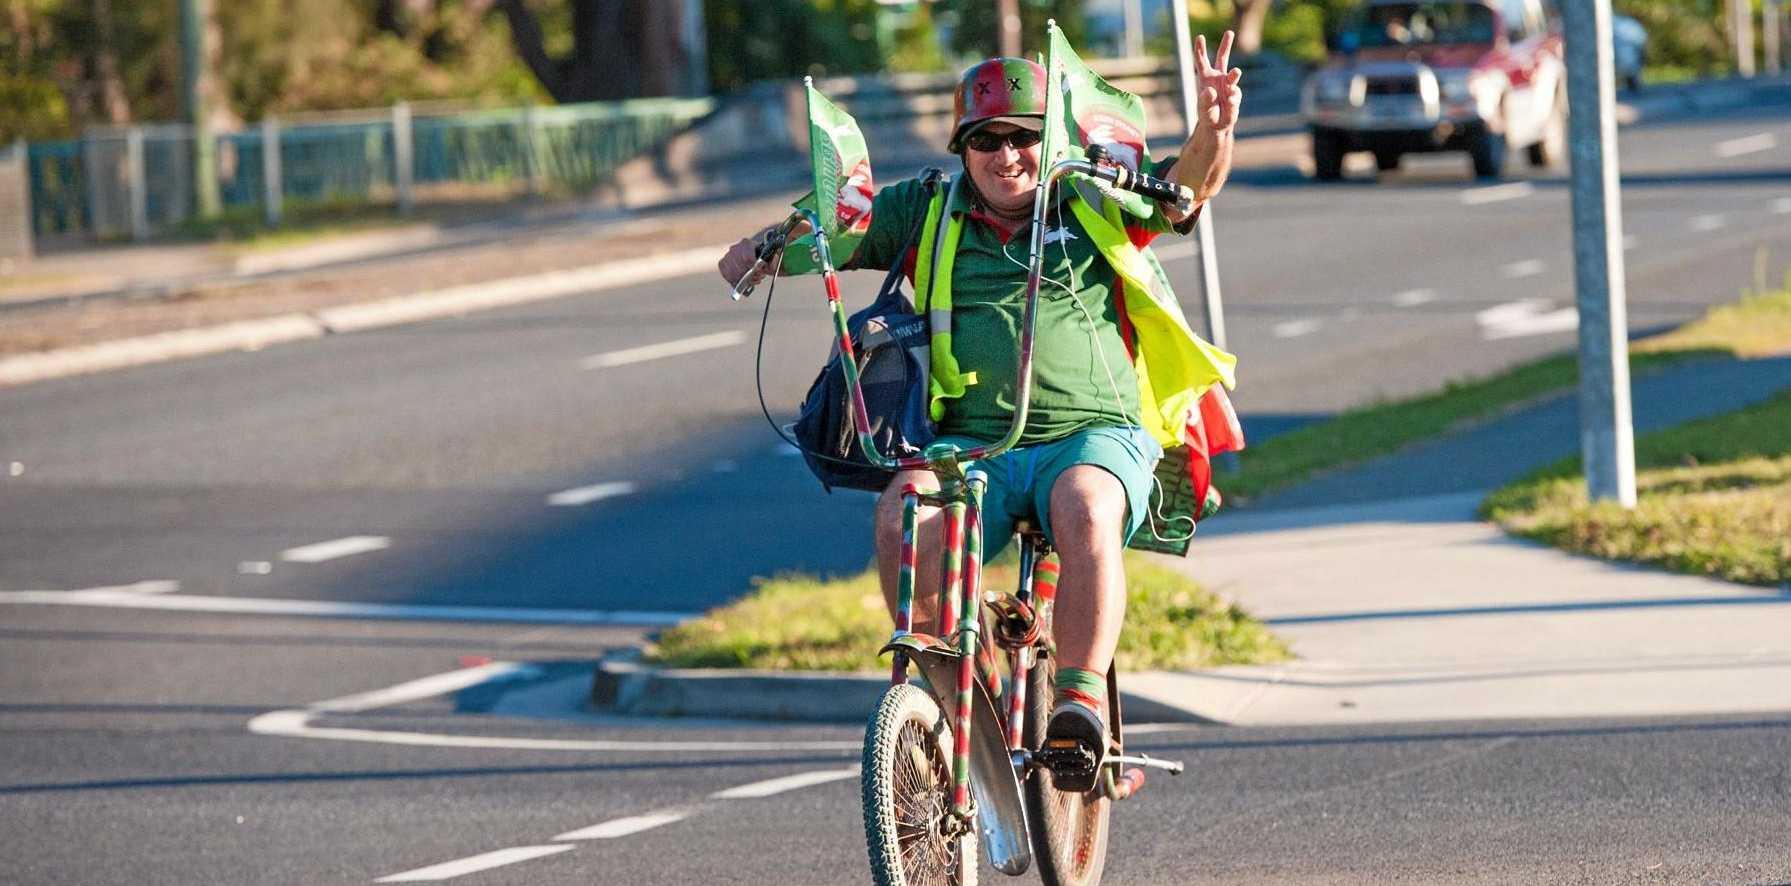 GO THE BUNNIES: David 'Speedy' Ellis proudly flies the colours of the South Sydney Rabbitohs.